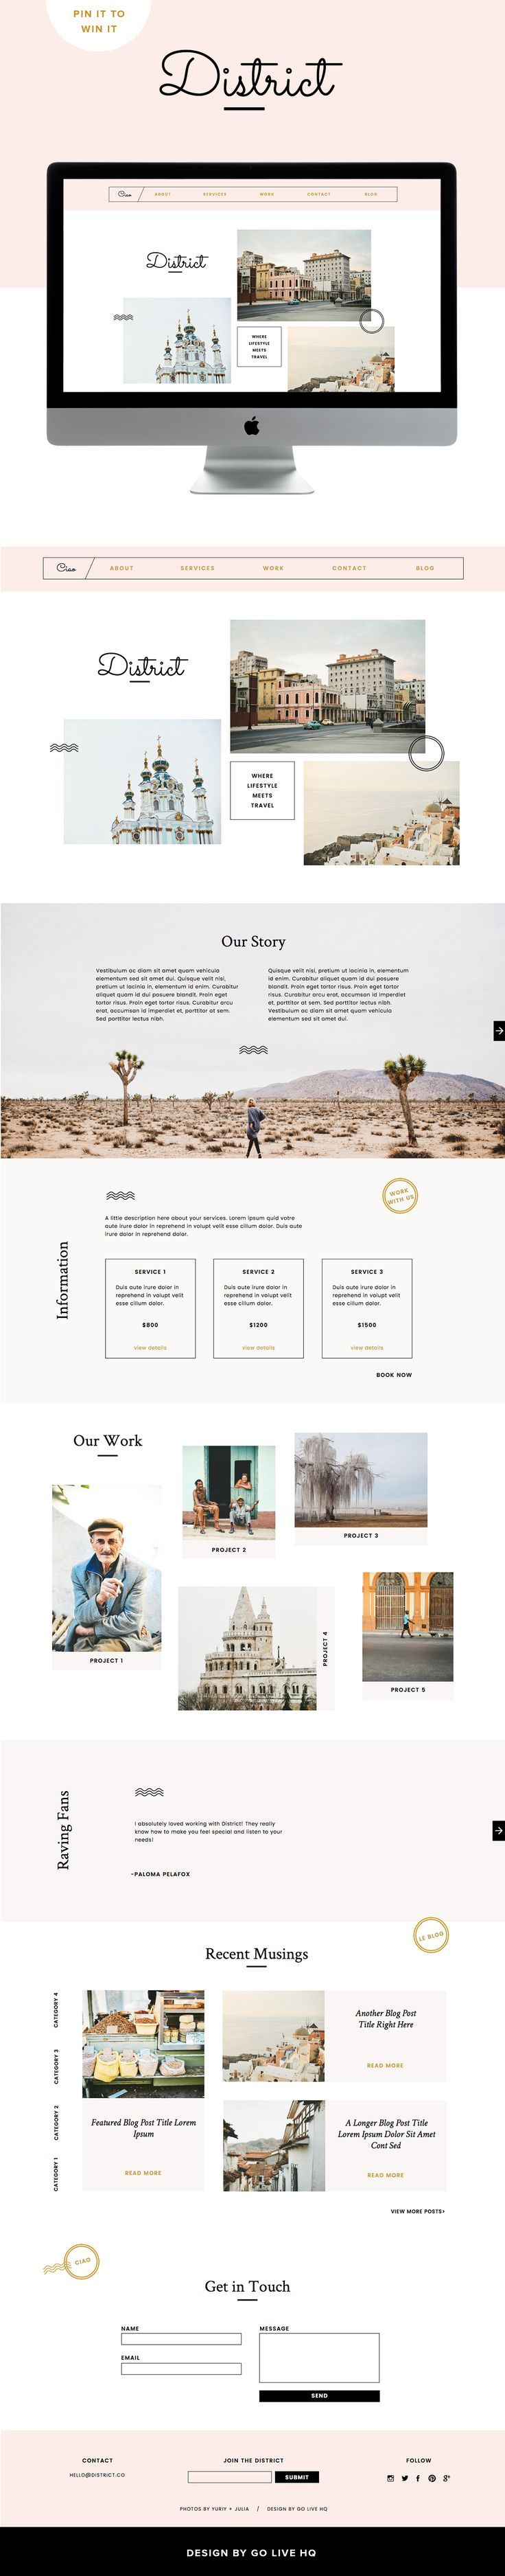 183 best creative design images on pinterest graph design pretty modern new website theme website design layoutwebsite fandeluxe Gallery